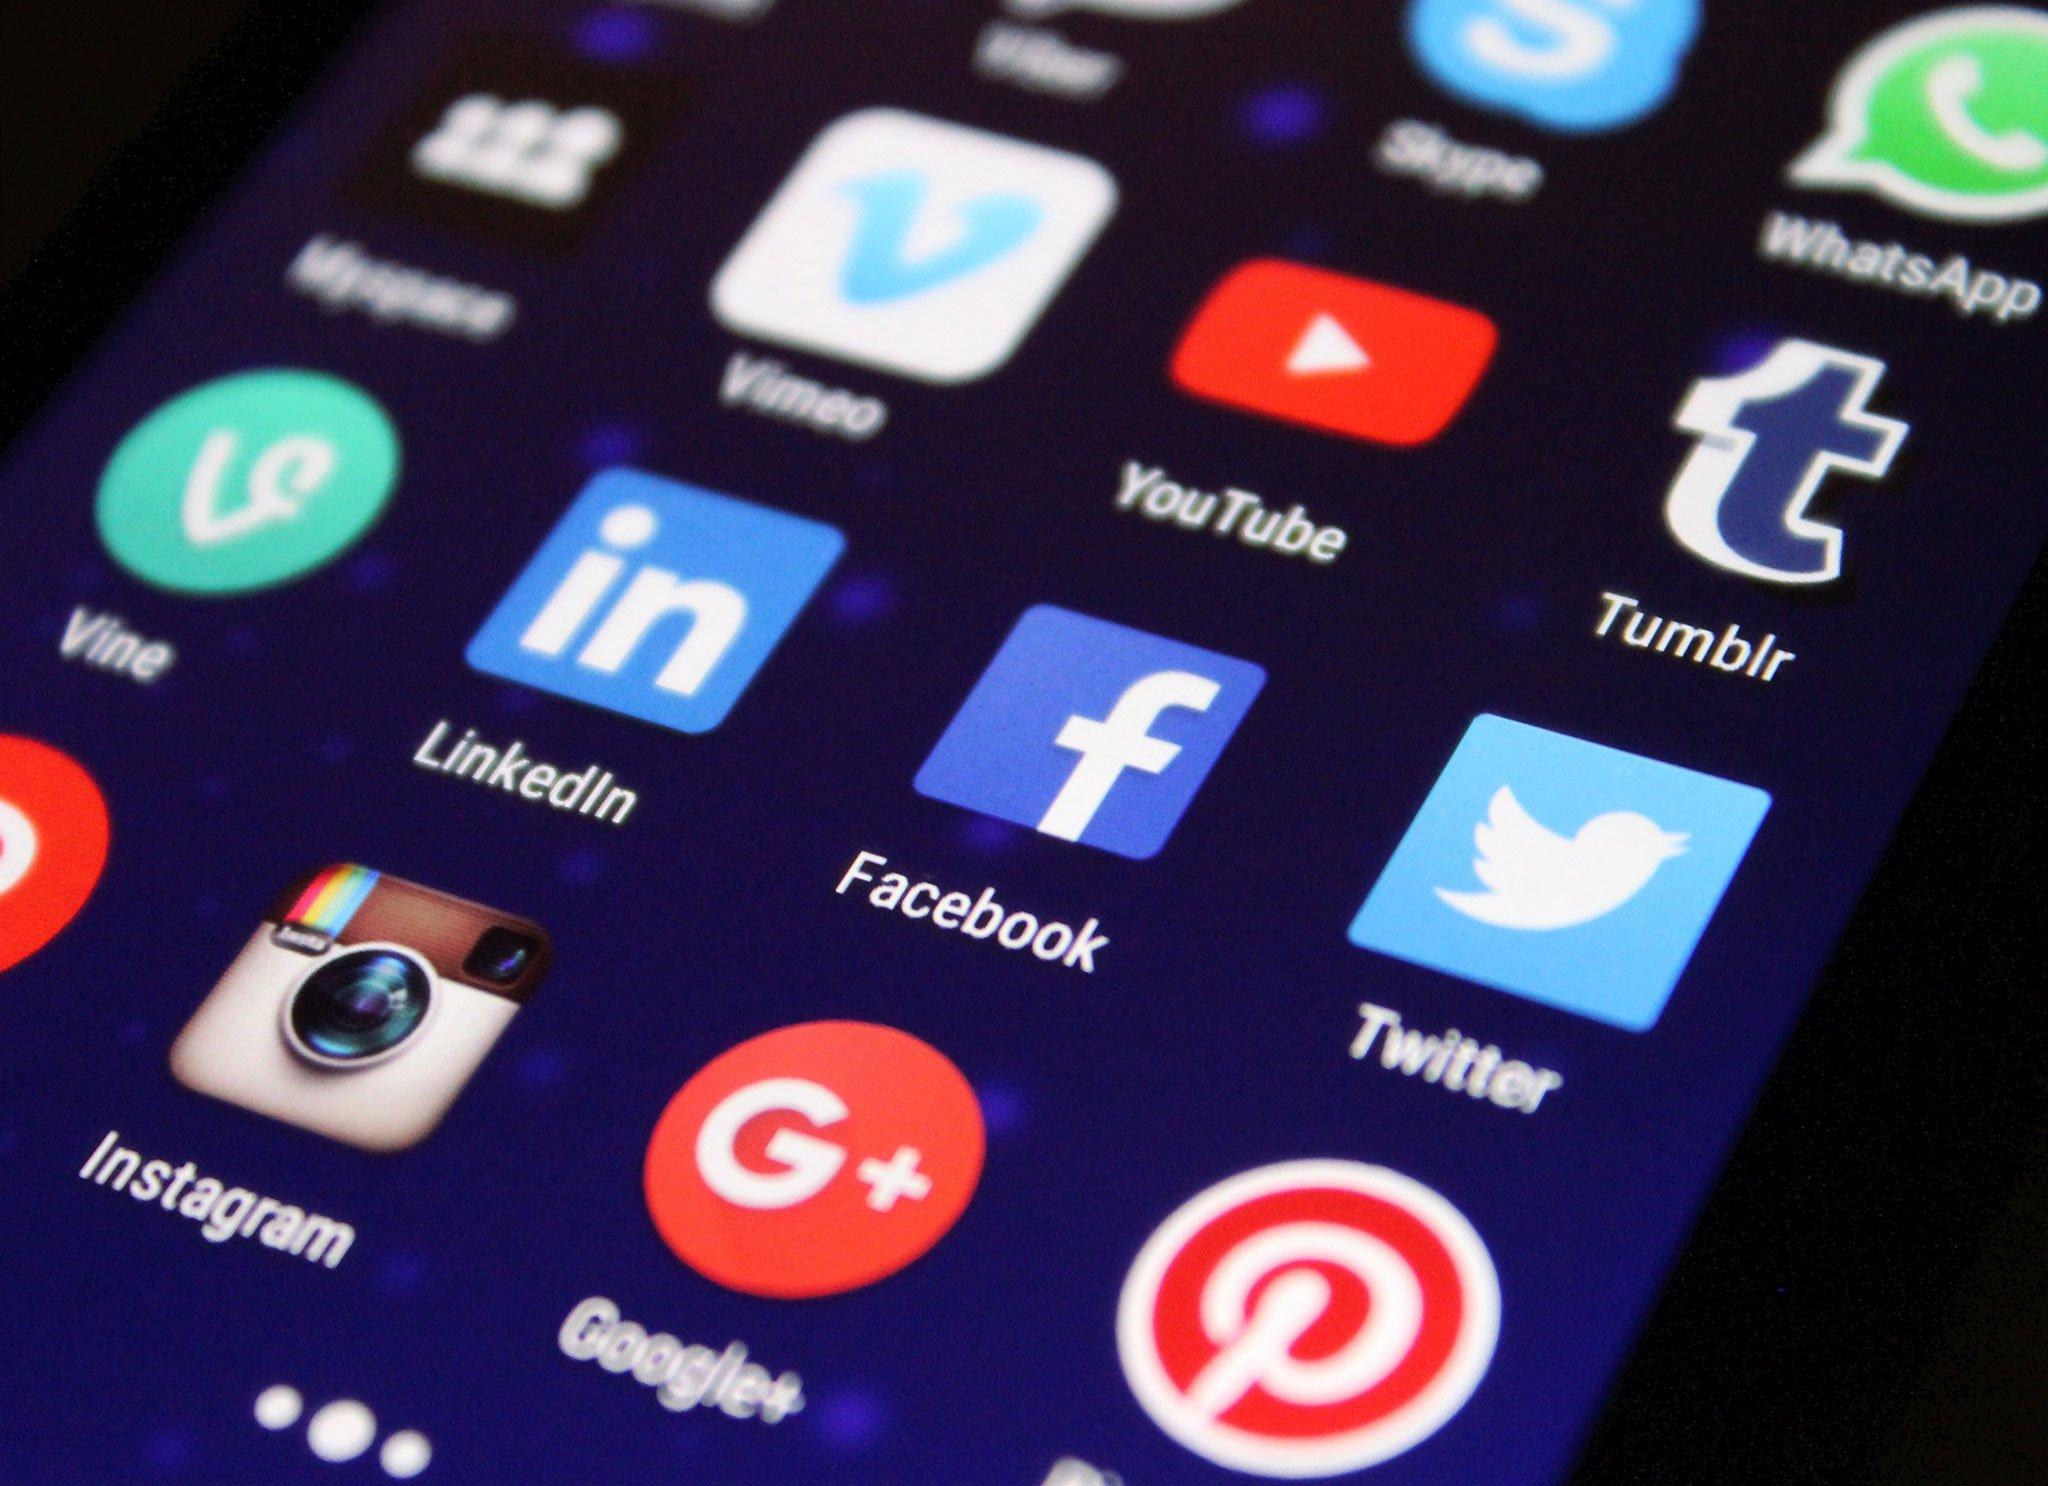 Images of Social media platforms were uploaded for The Clutch of Comparison blog post